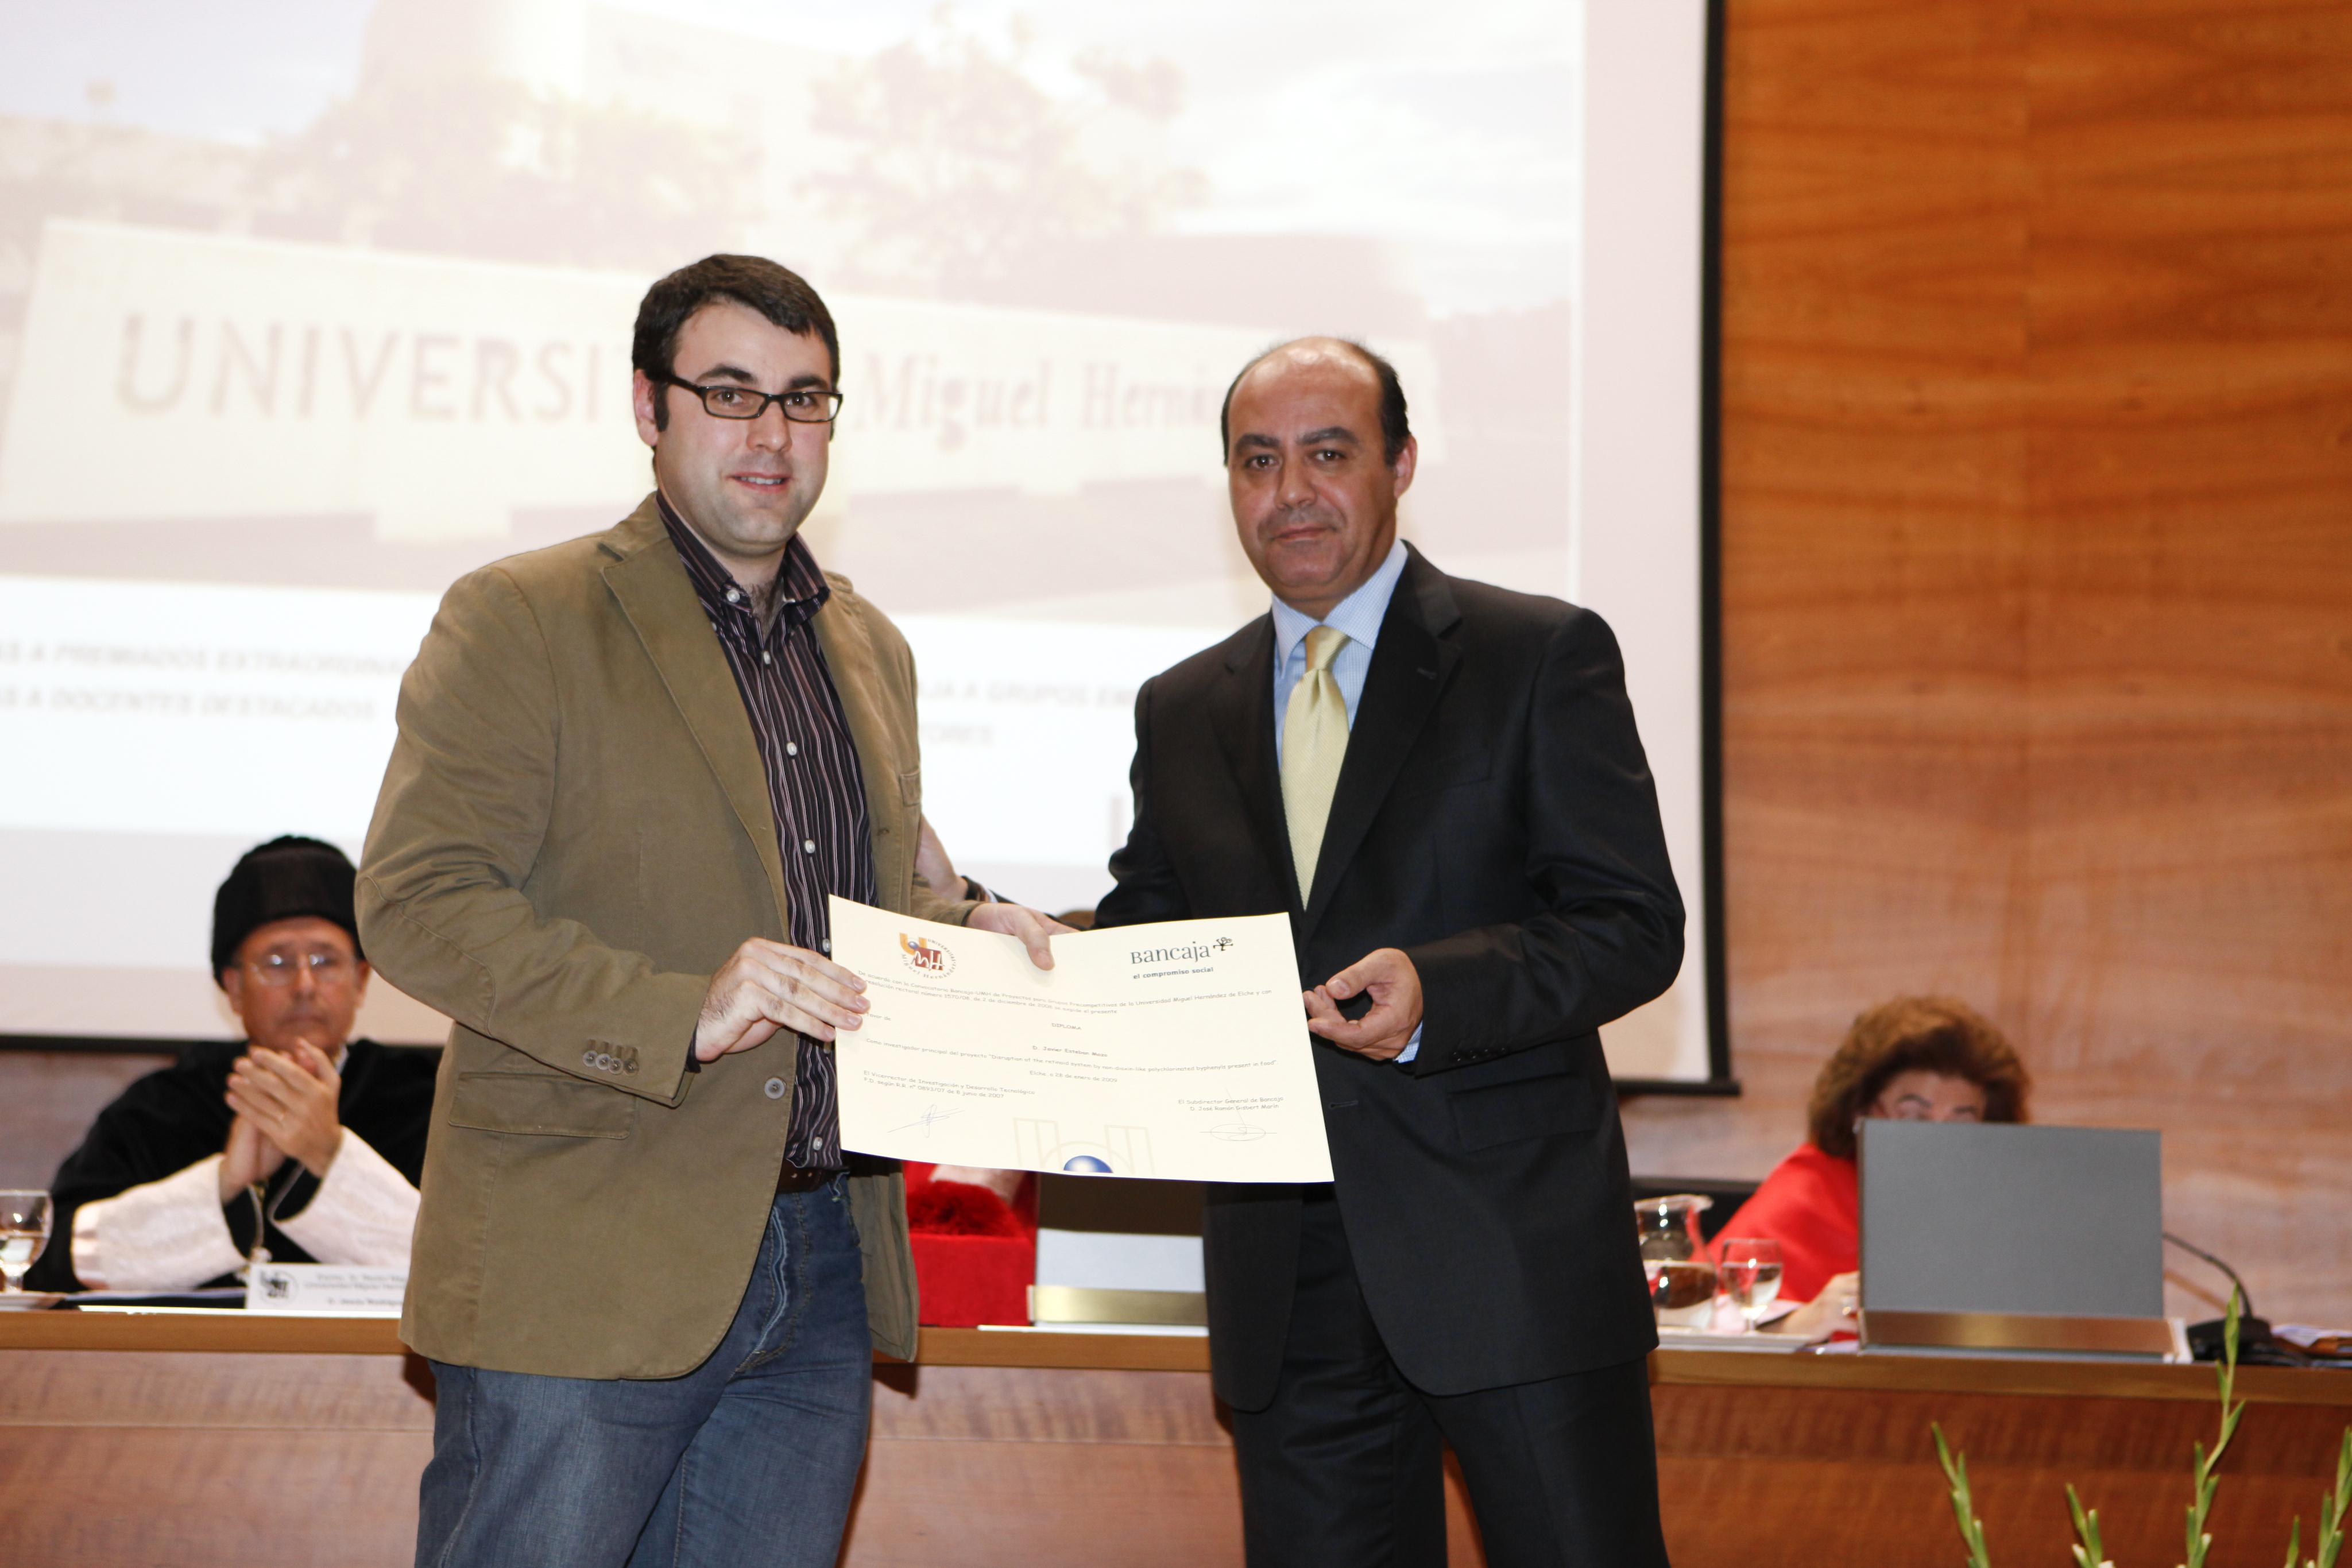 Entrega Diplomas_mg_5250.jpg